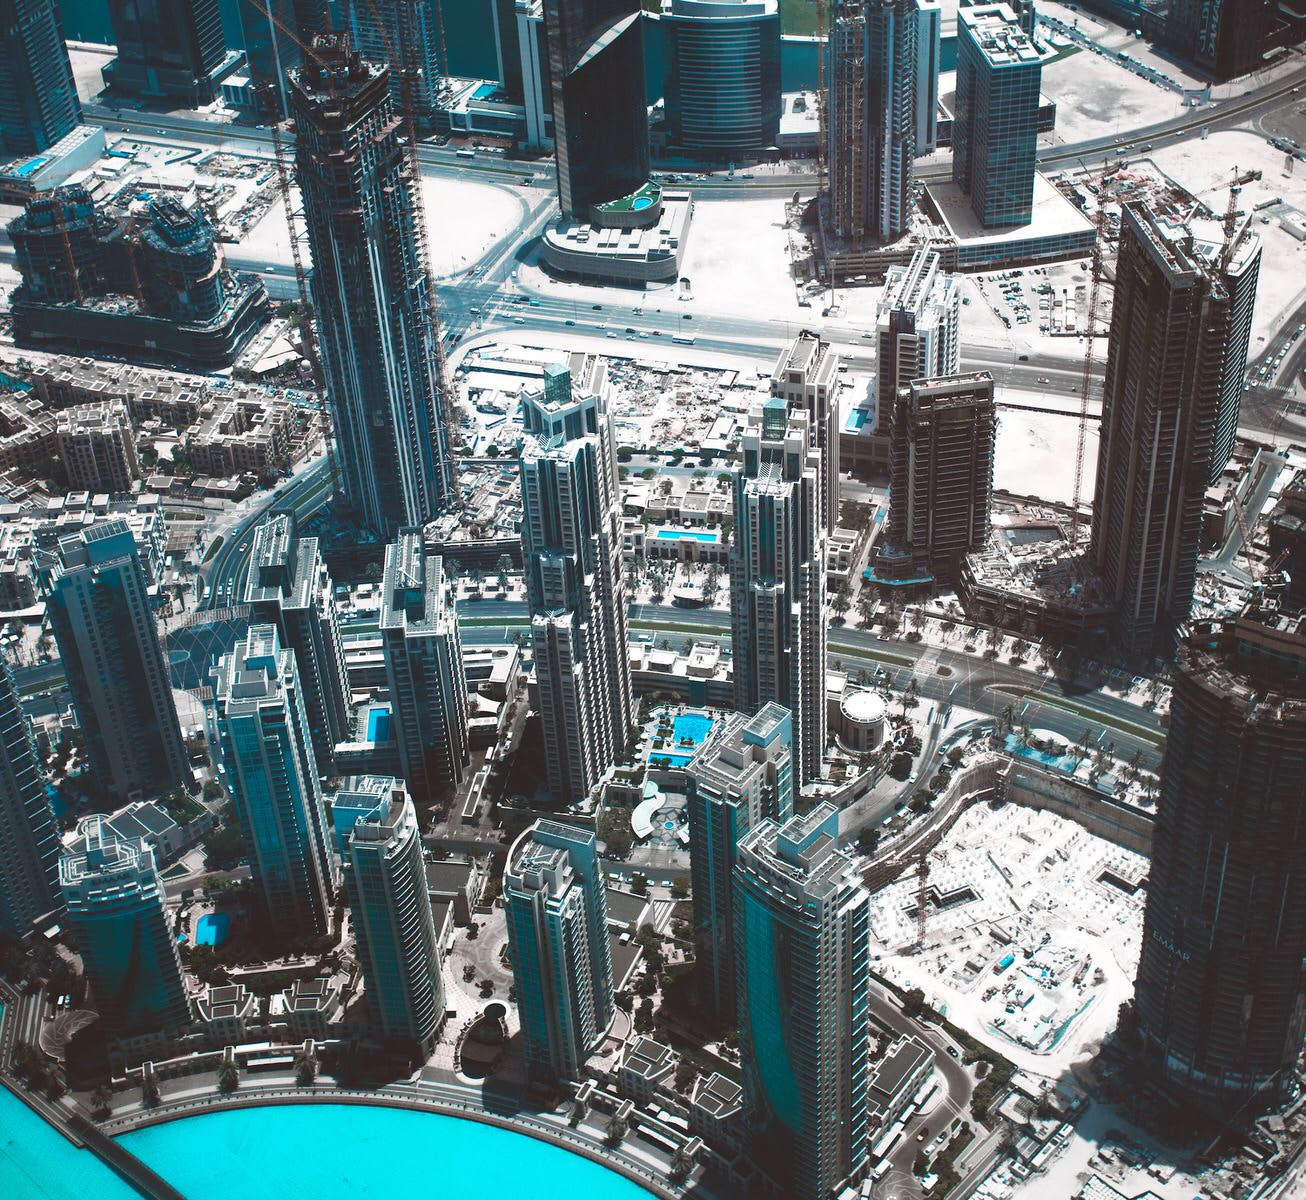 Burj Khalifa, Dubai, United Arab Emirates. Photo credit: Joshua Fuller